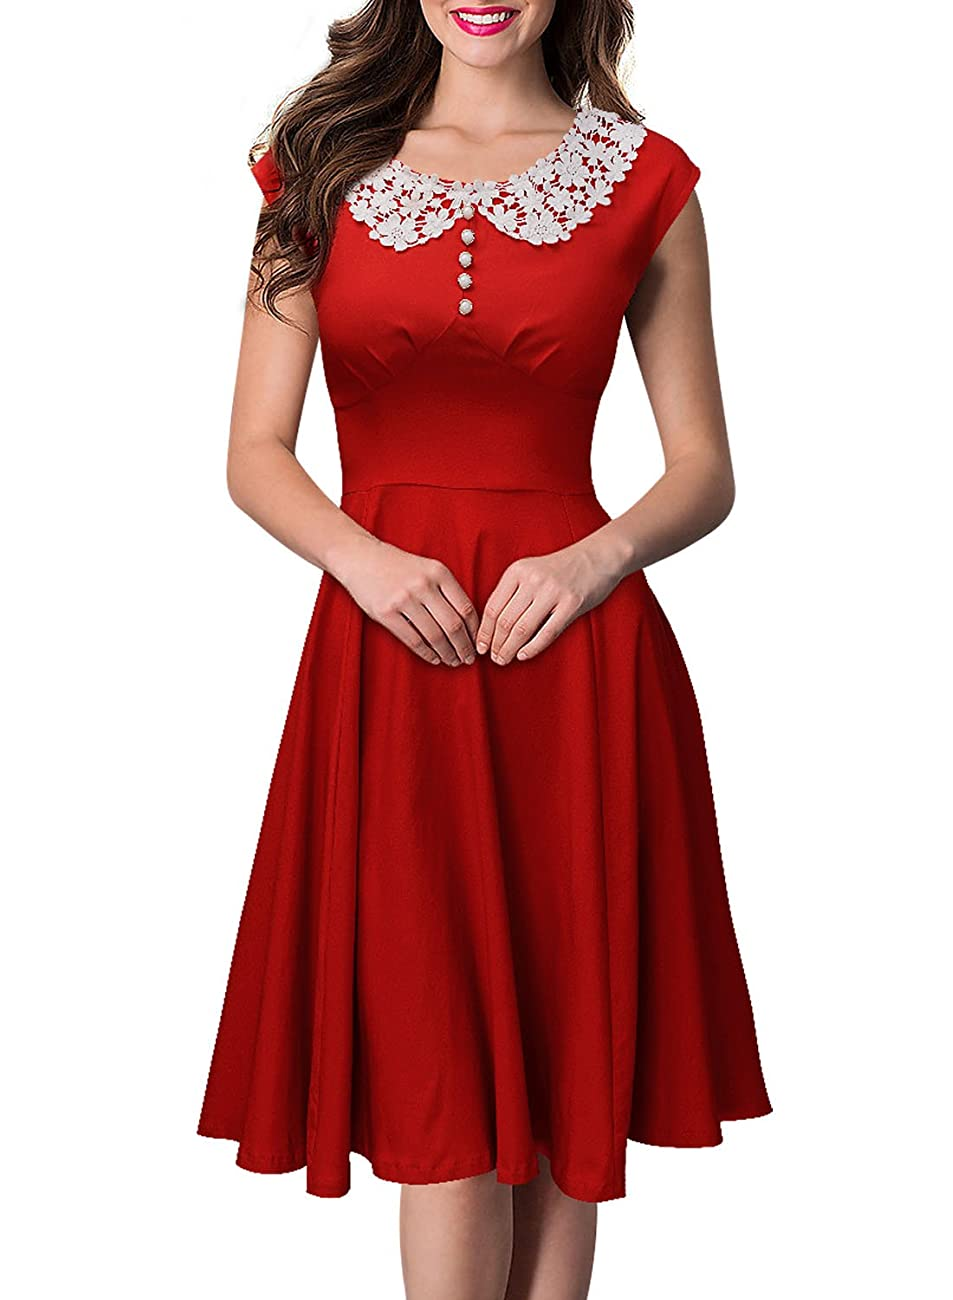 Miusol Women's Classy Vintage Audrey Hepburn Style 1940's Rockabilly Evening Dress 0